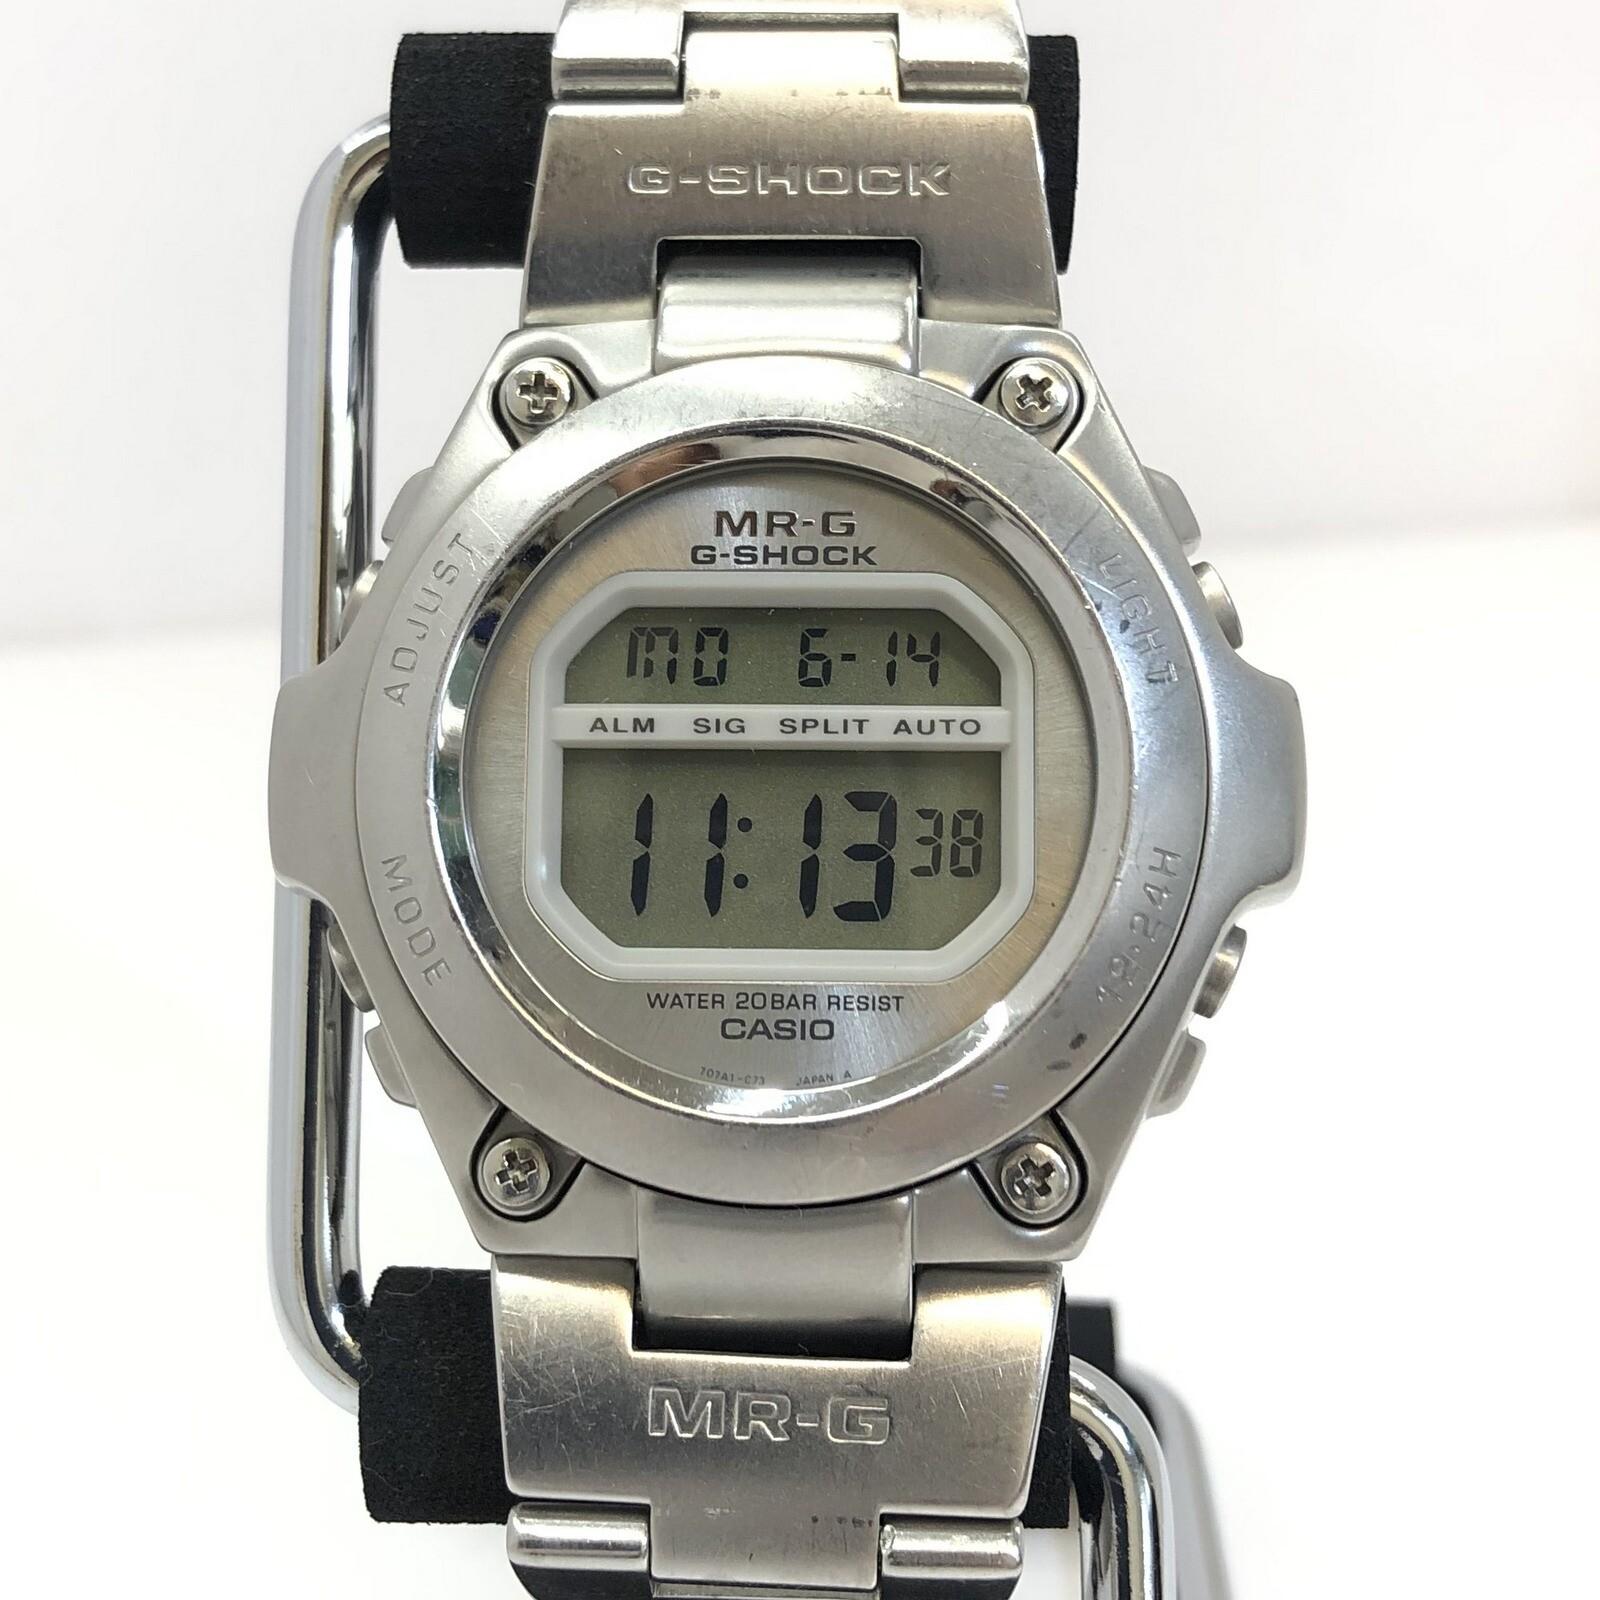 G-SHOCK ジーショック CASIO カシオ 腕時計 MRG-100 MR-G アウトレット デジタル クォーツ ラウンドフェイス シルバー RY4843 メンズ チタン 希少 フルメタル IT7UB03U7PS0 レア 日時指定 中古 T東大阪店 ビジネス